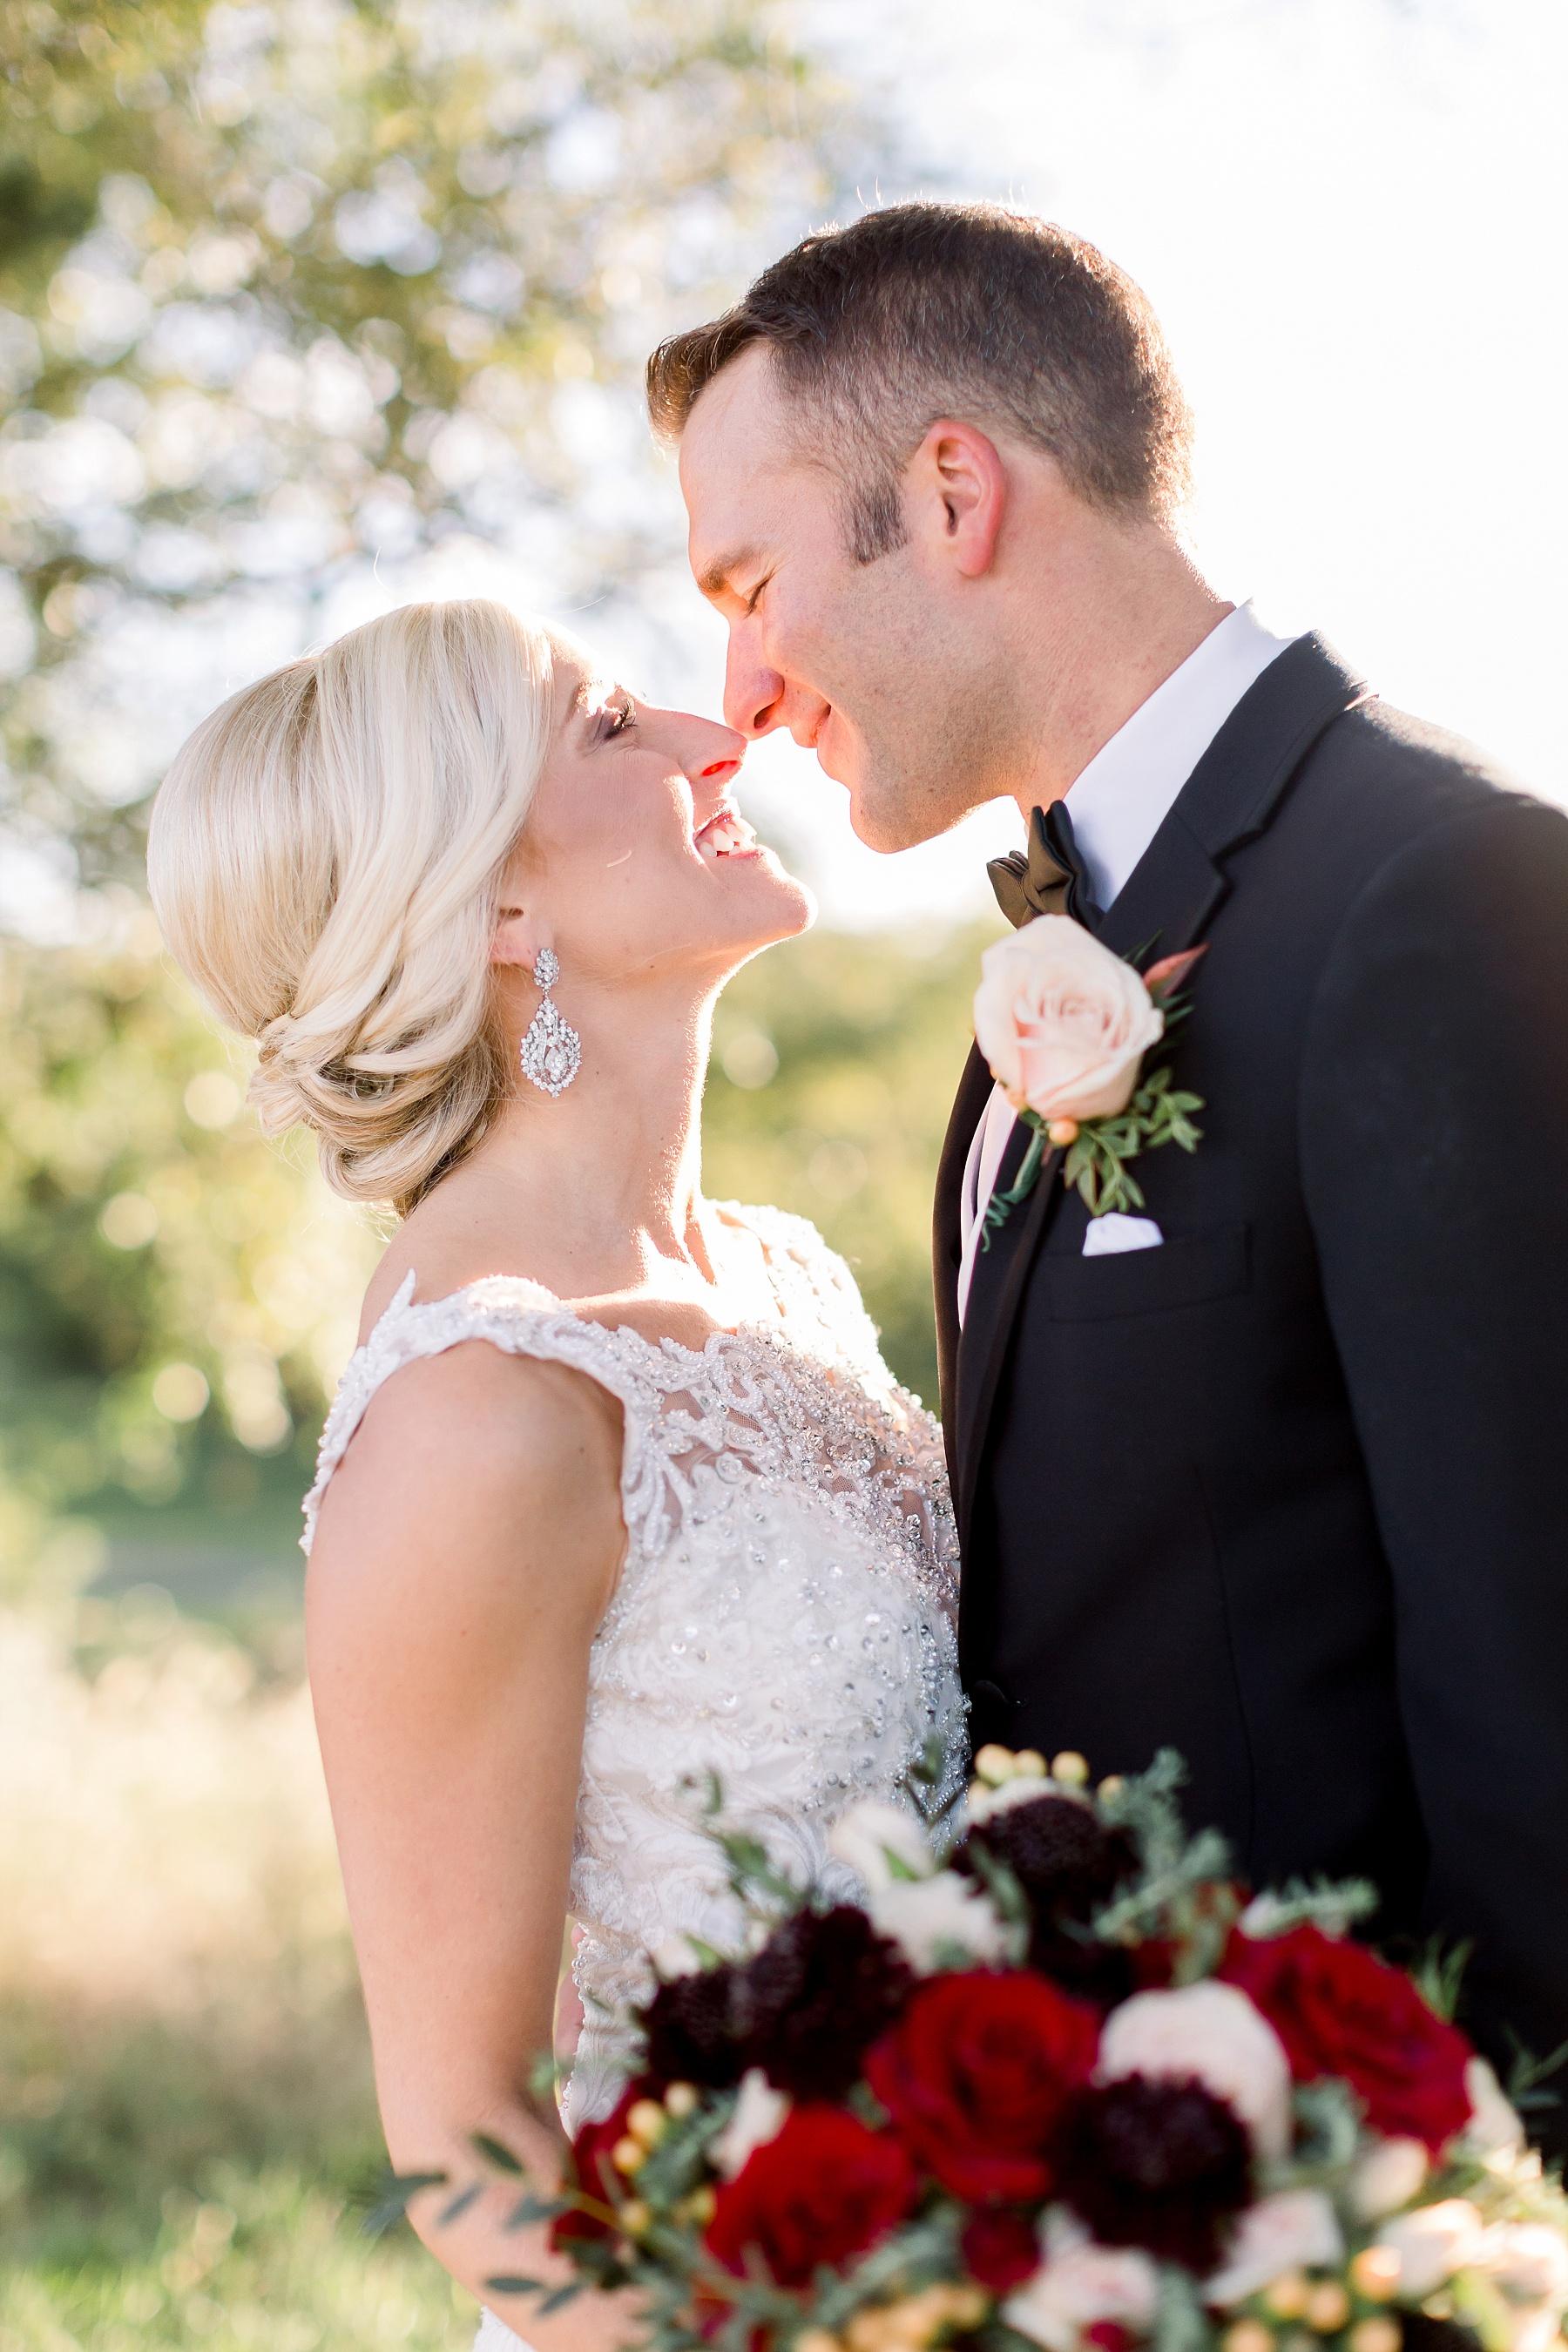 midwest-adventurous-wedding-photographer-elizabeth-ladean-photography-photo_4807.jpg